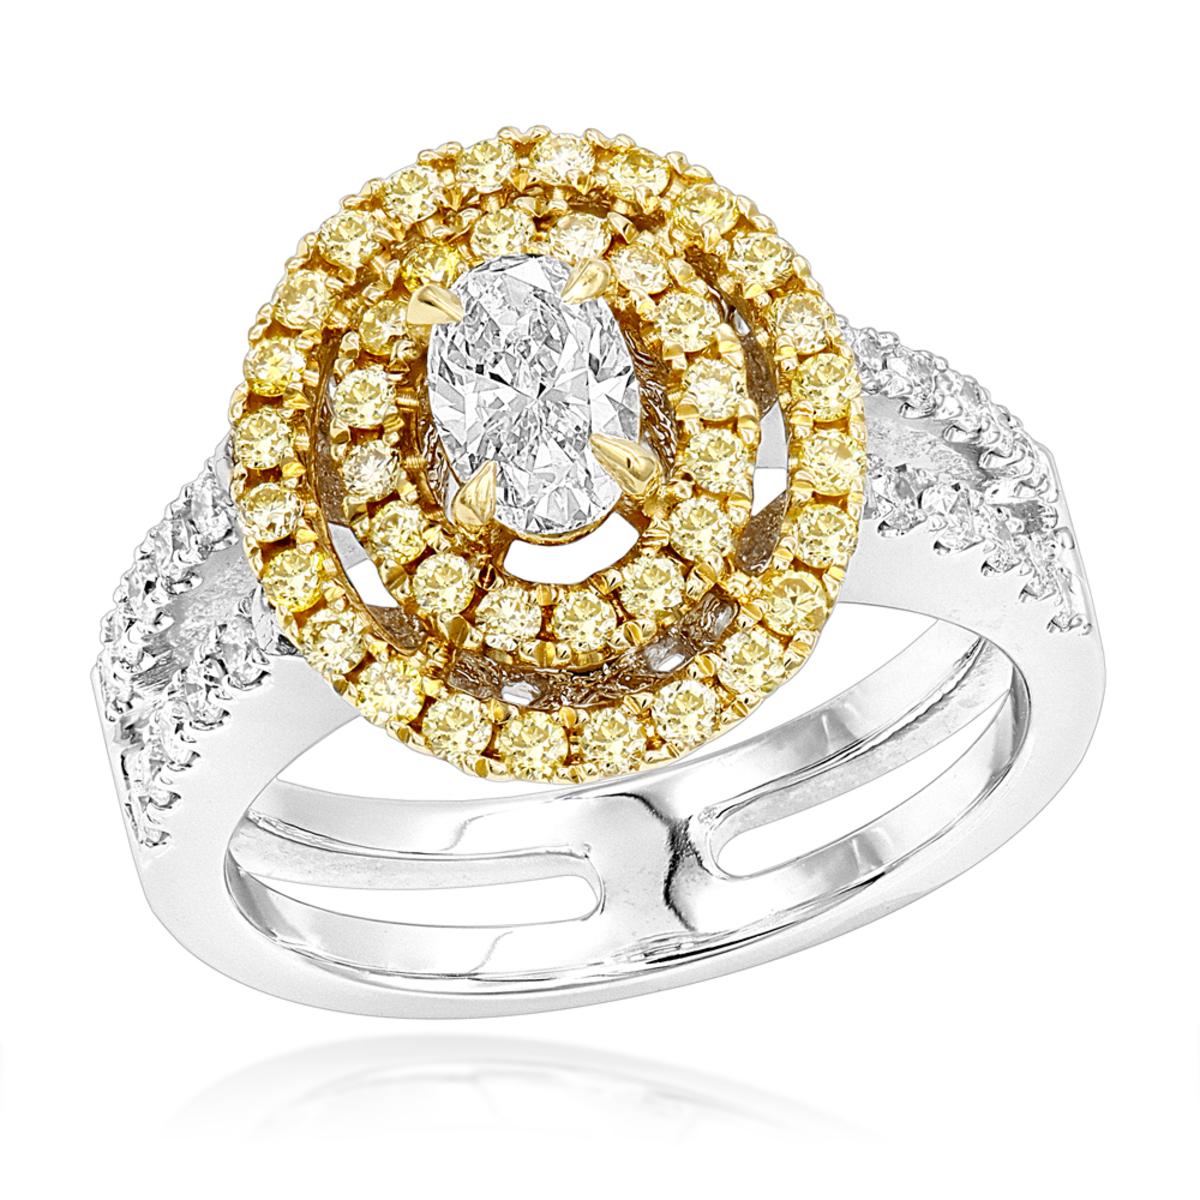 Unique 18K 2 Tone Gold Oval Diamond Engagement Ring White & Yellow Diamonds